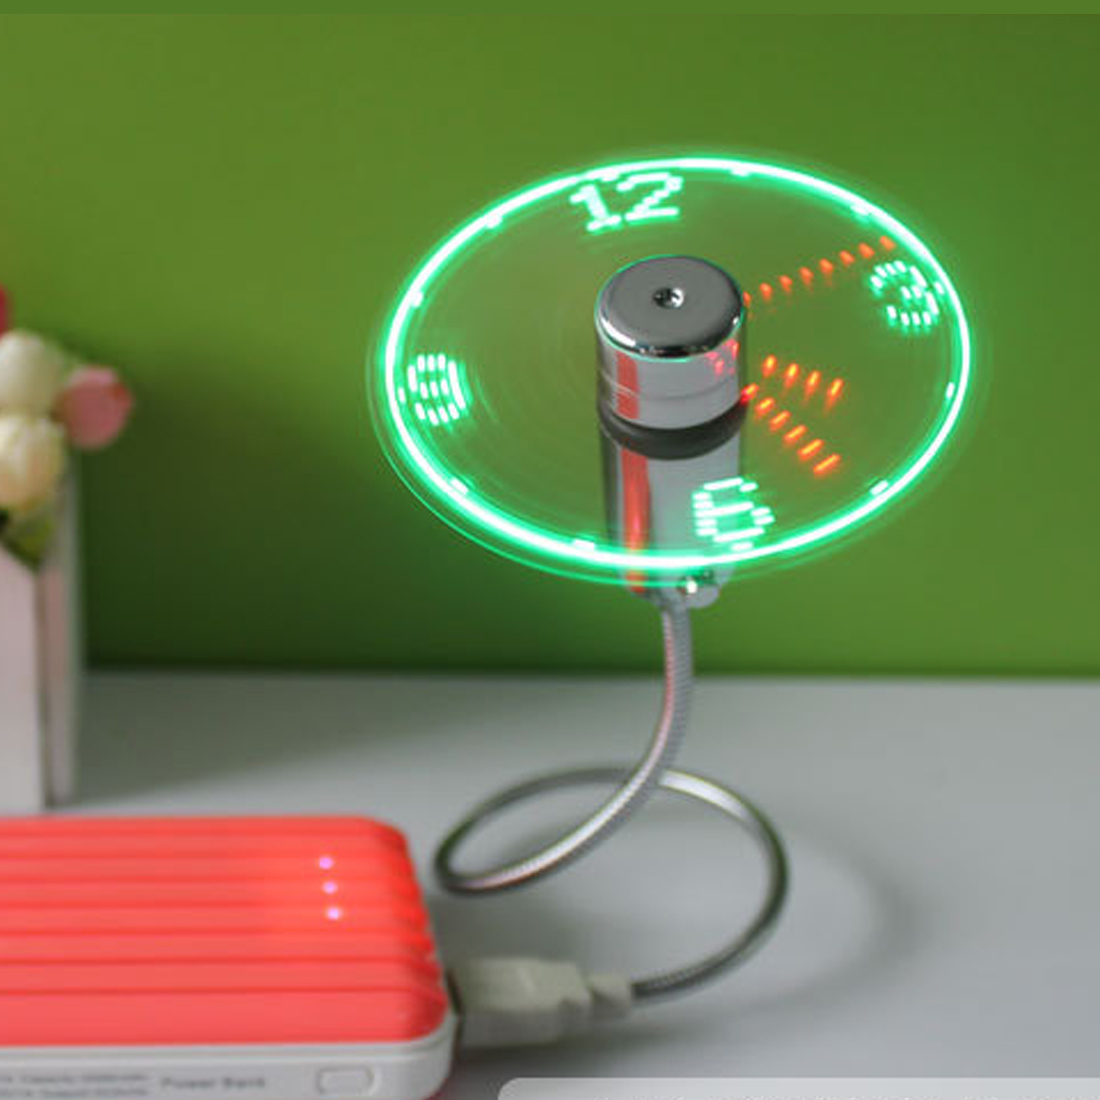 NOYOKERE Hot Mini USB Fan gadgets Flexible Gooseneck LED Clock Cool For laptop PC Notebook Time Display high quality Adjustable